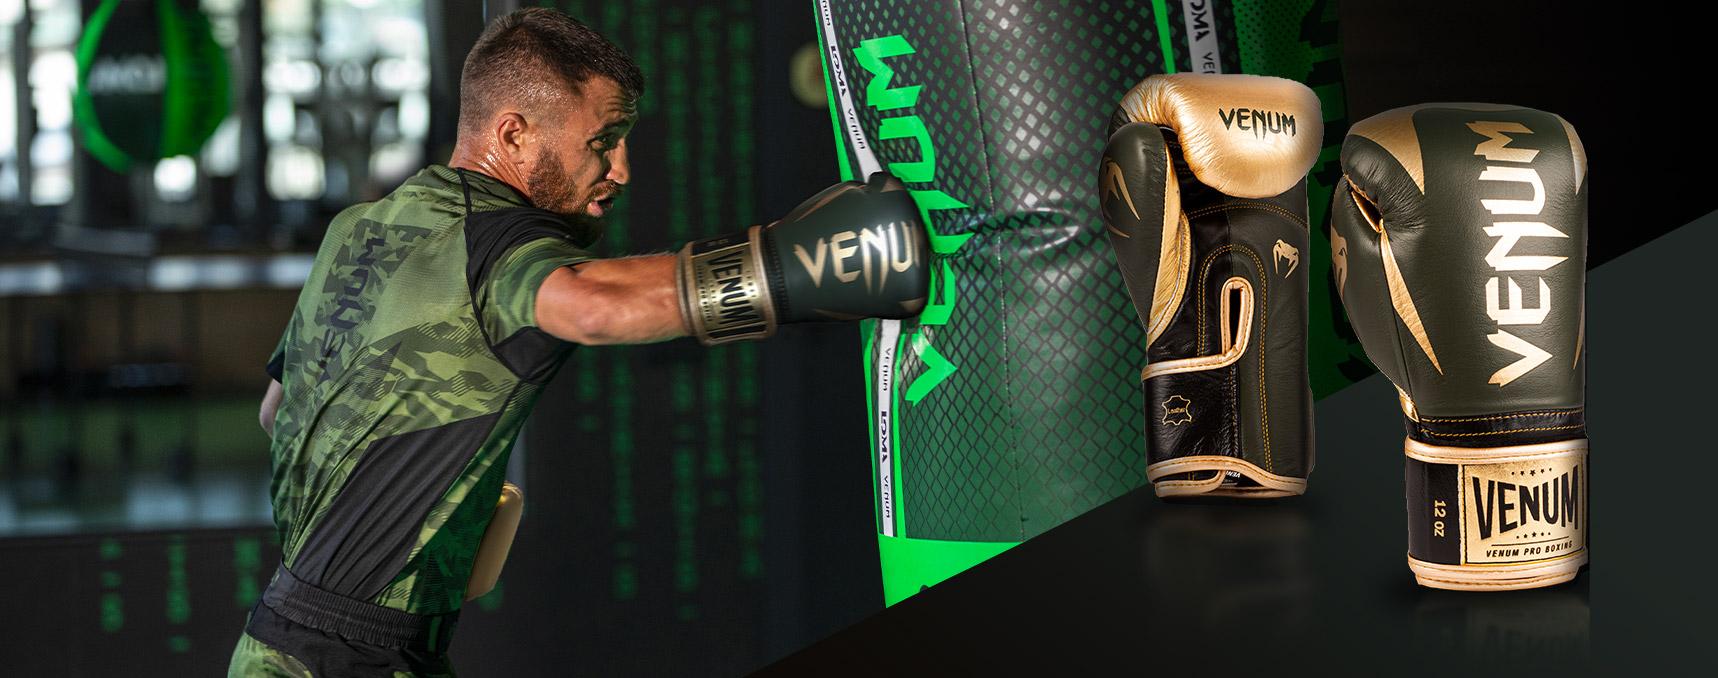 Venum Pro Boxing Gear